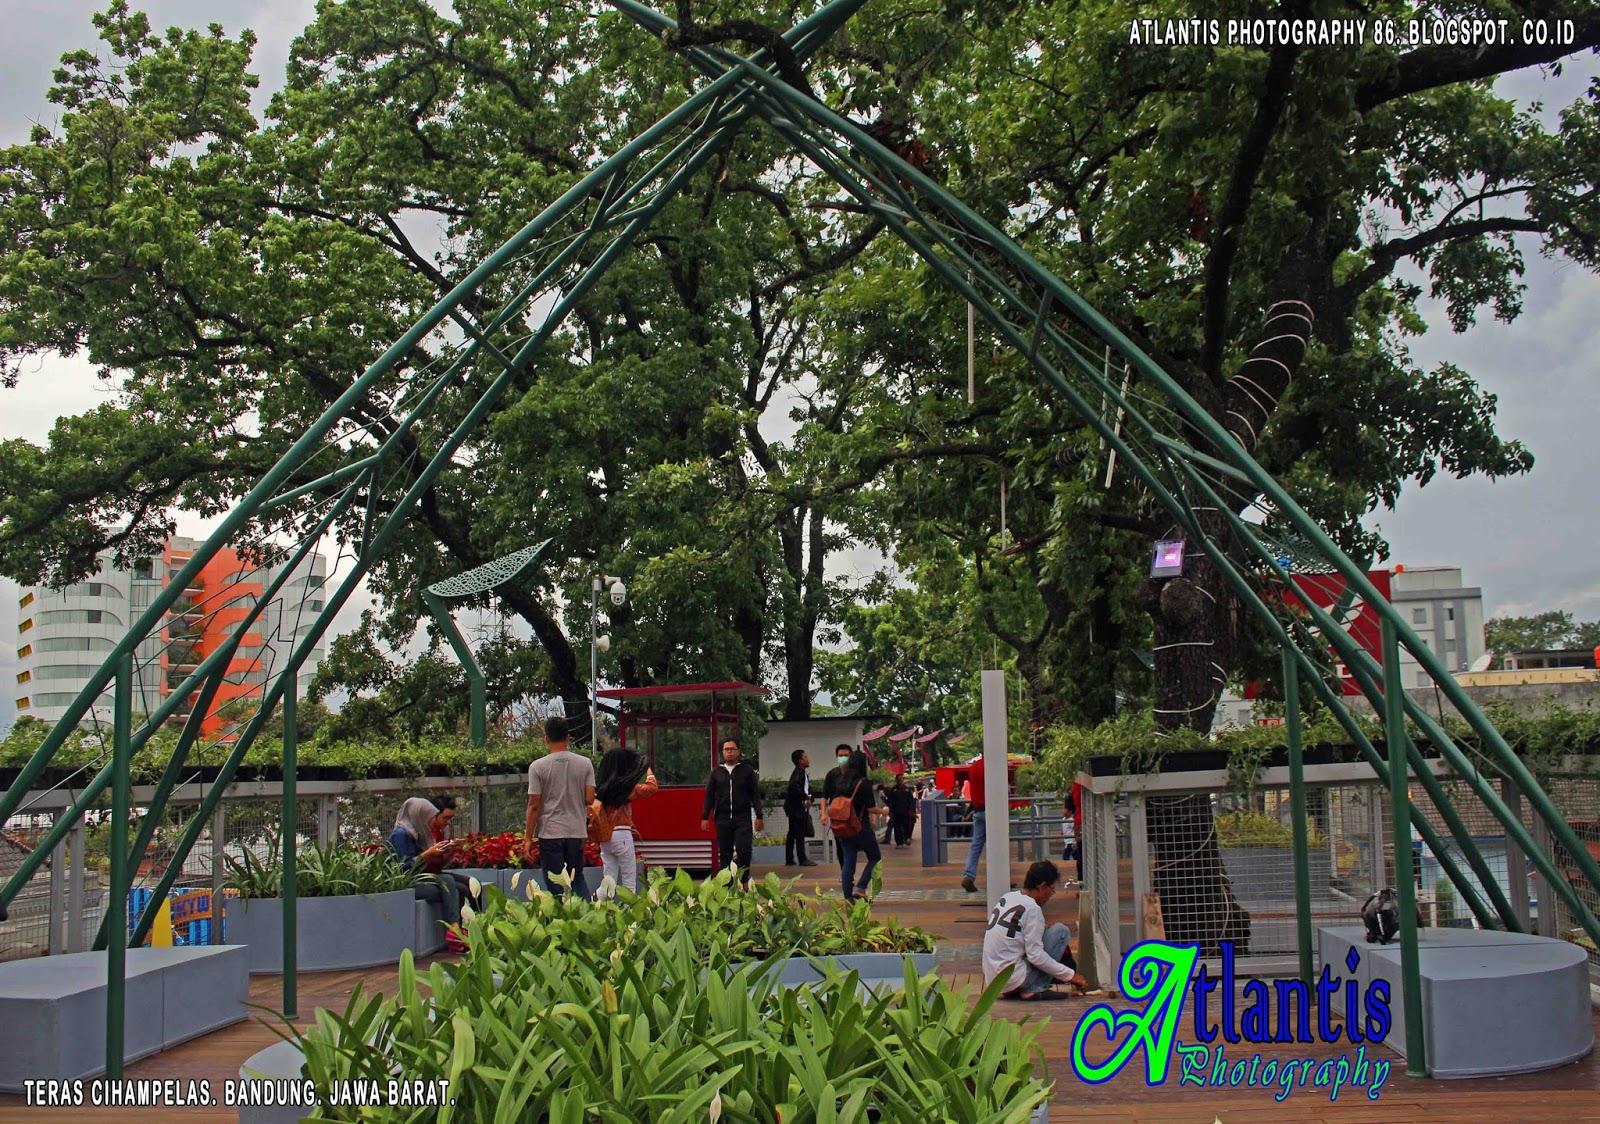 Atlantis Photography Krui Teras Cihampelas Bandung Sorotan Taman Layang Gantung